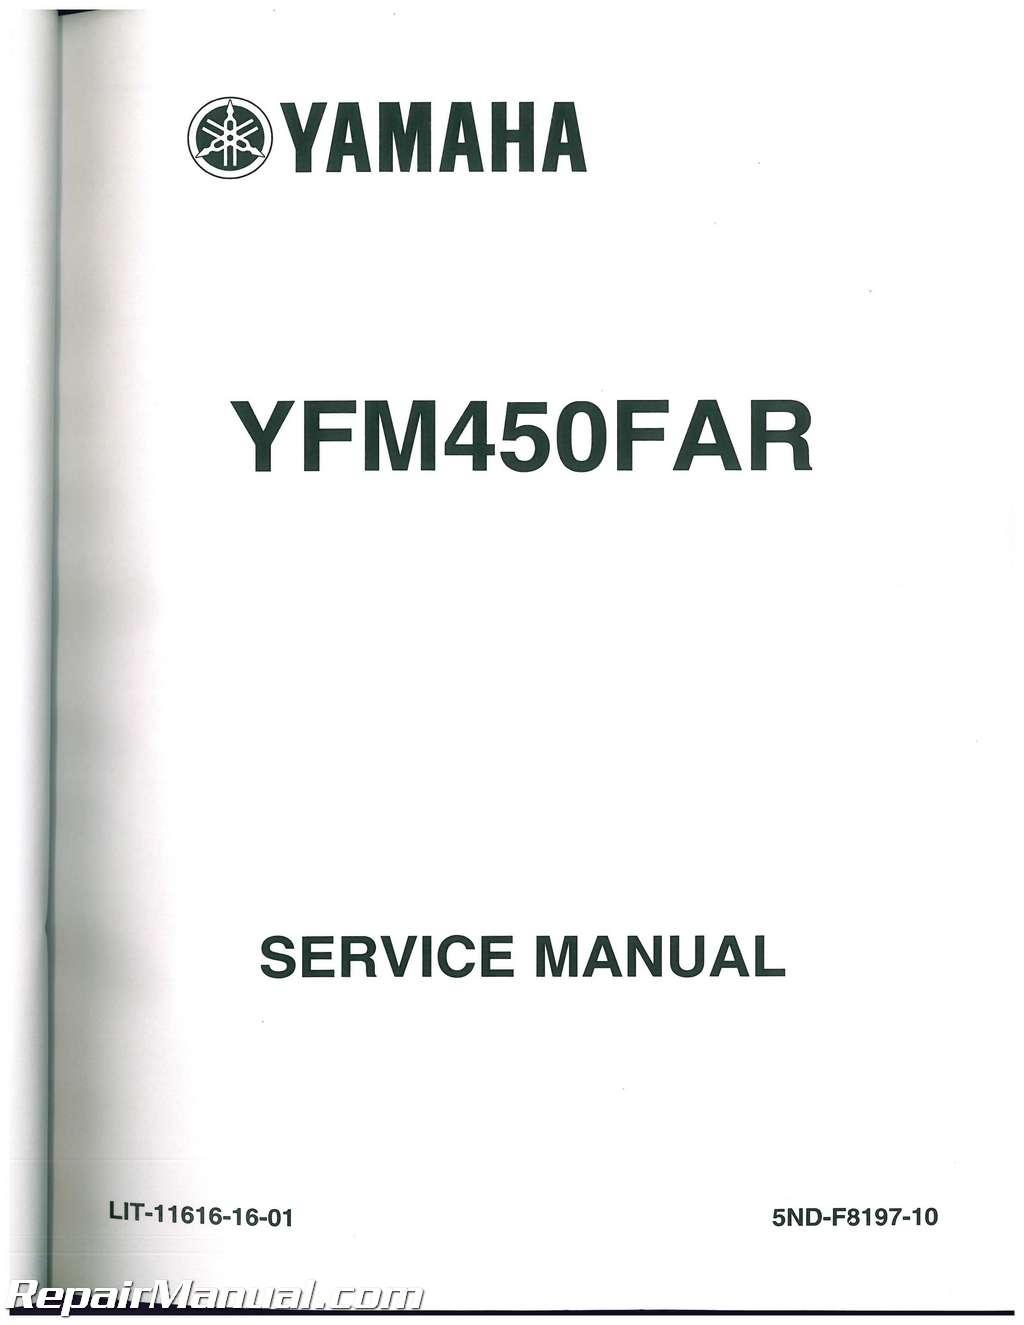 hight resolution of 2003 2006 yamaha kodiak 450 4wd 2007 2014 grizzly 450 4wd service manual rh repairmanual com alpine amp wiring diagram 2003 yamaha kodiak wiring diagram